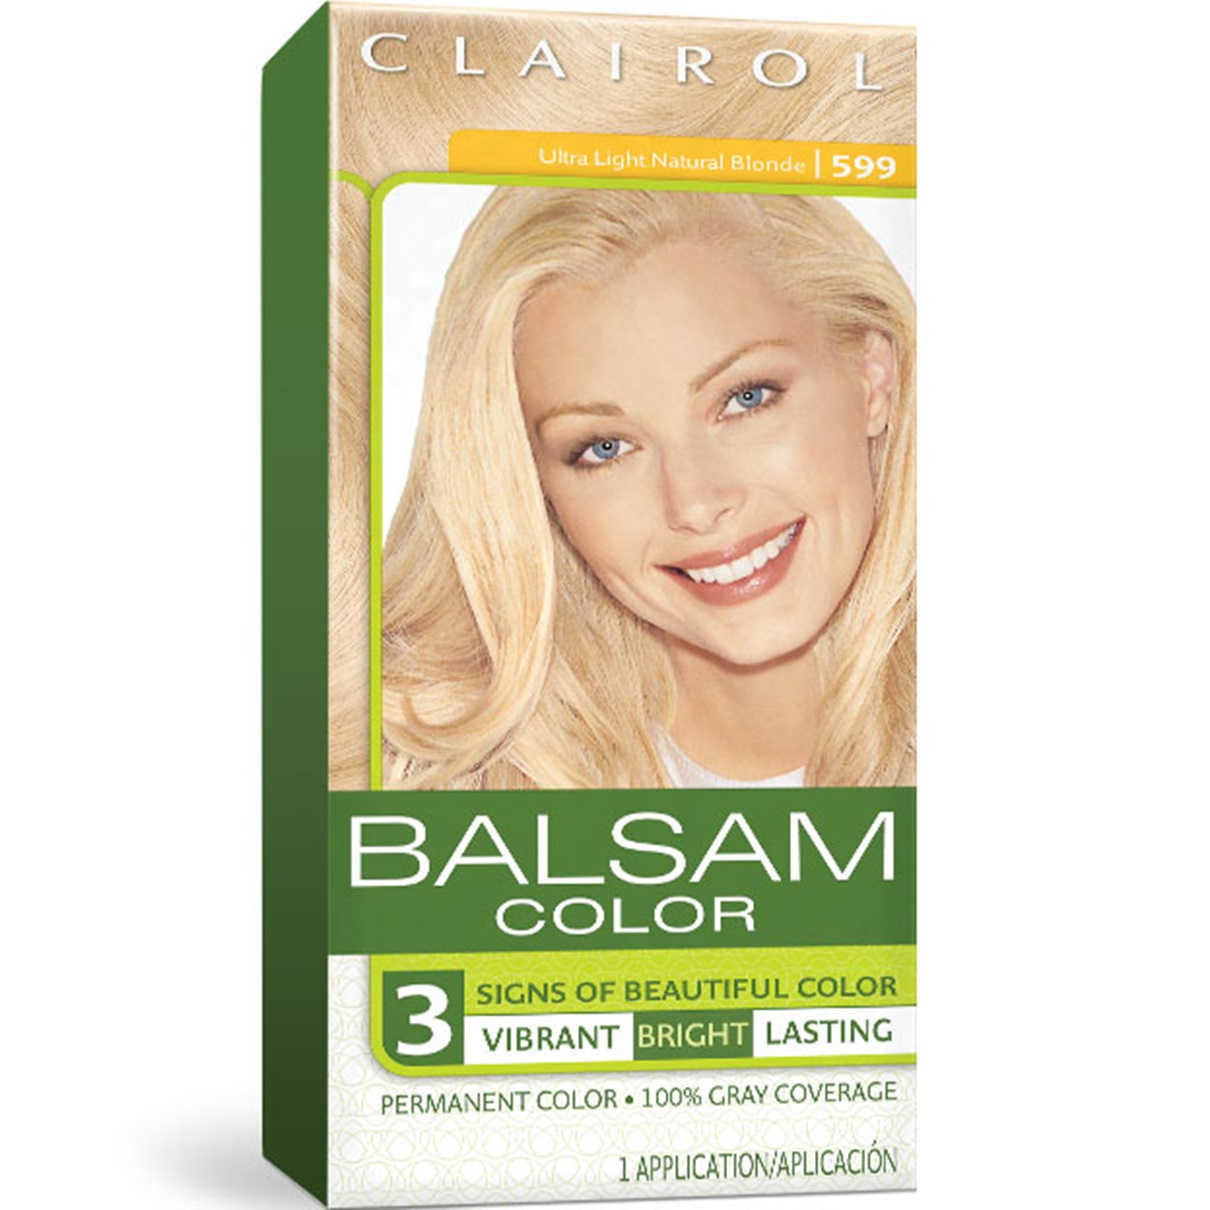 Balsam Permanent Blonde Hair Color Clairol